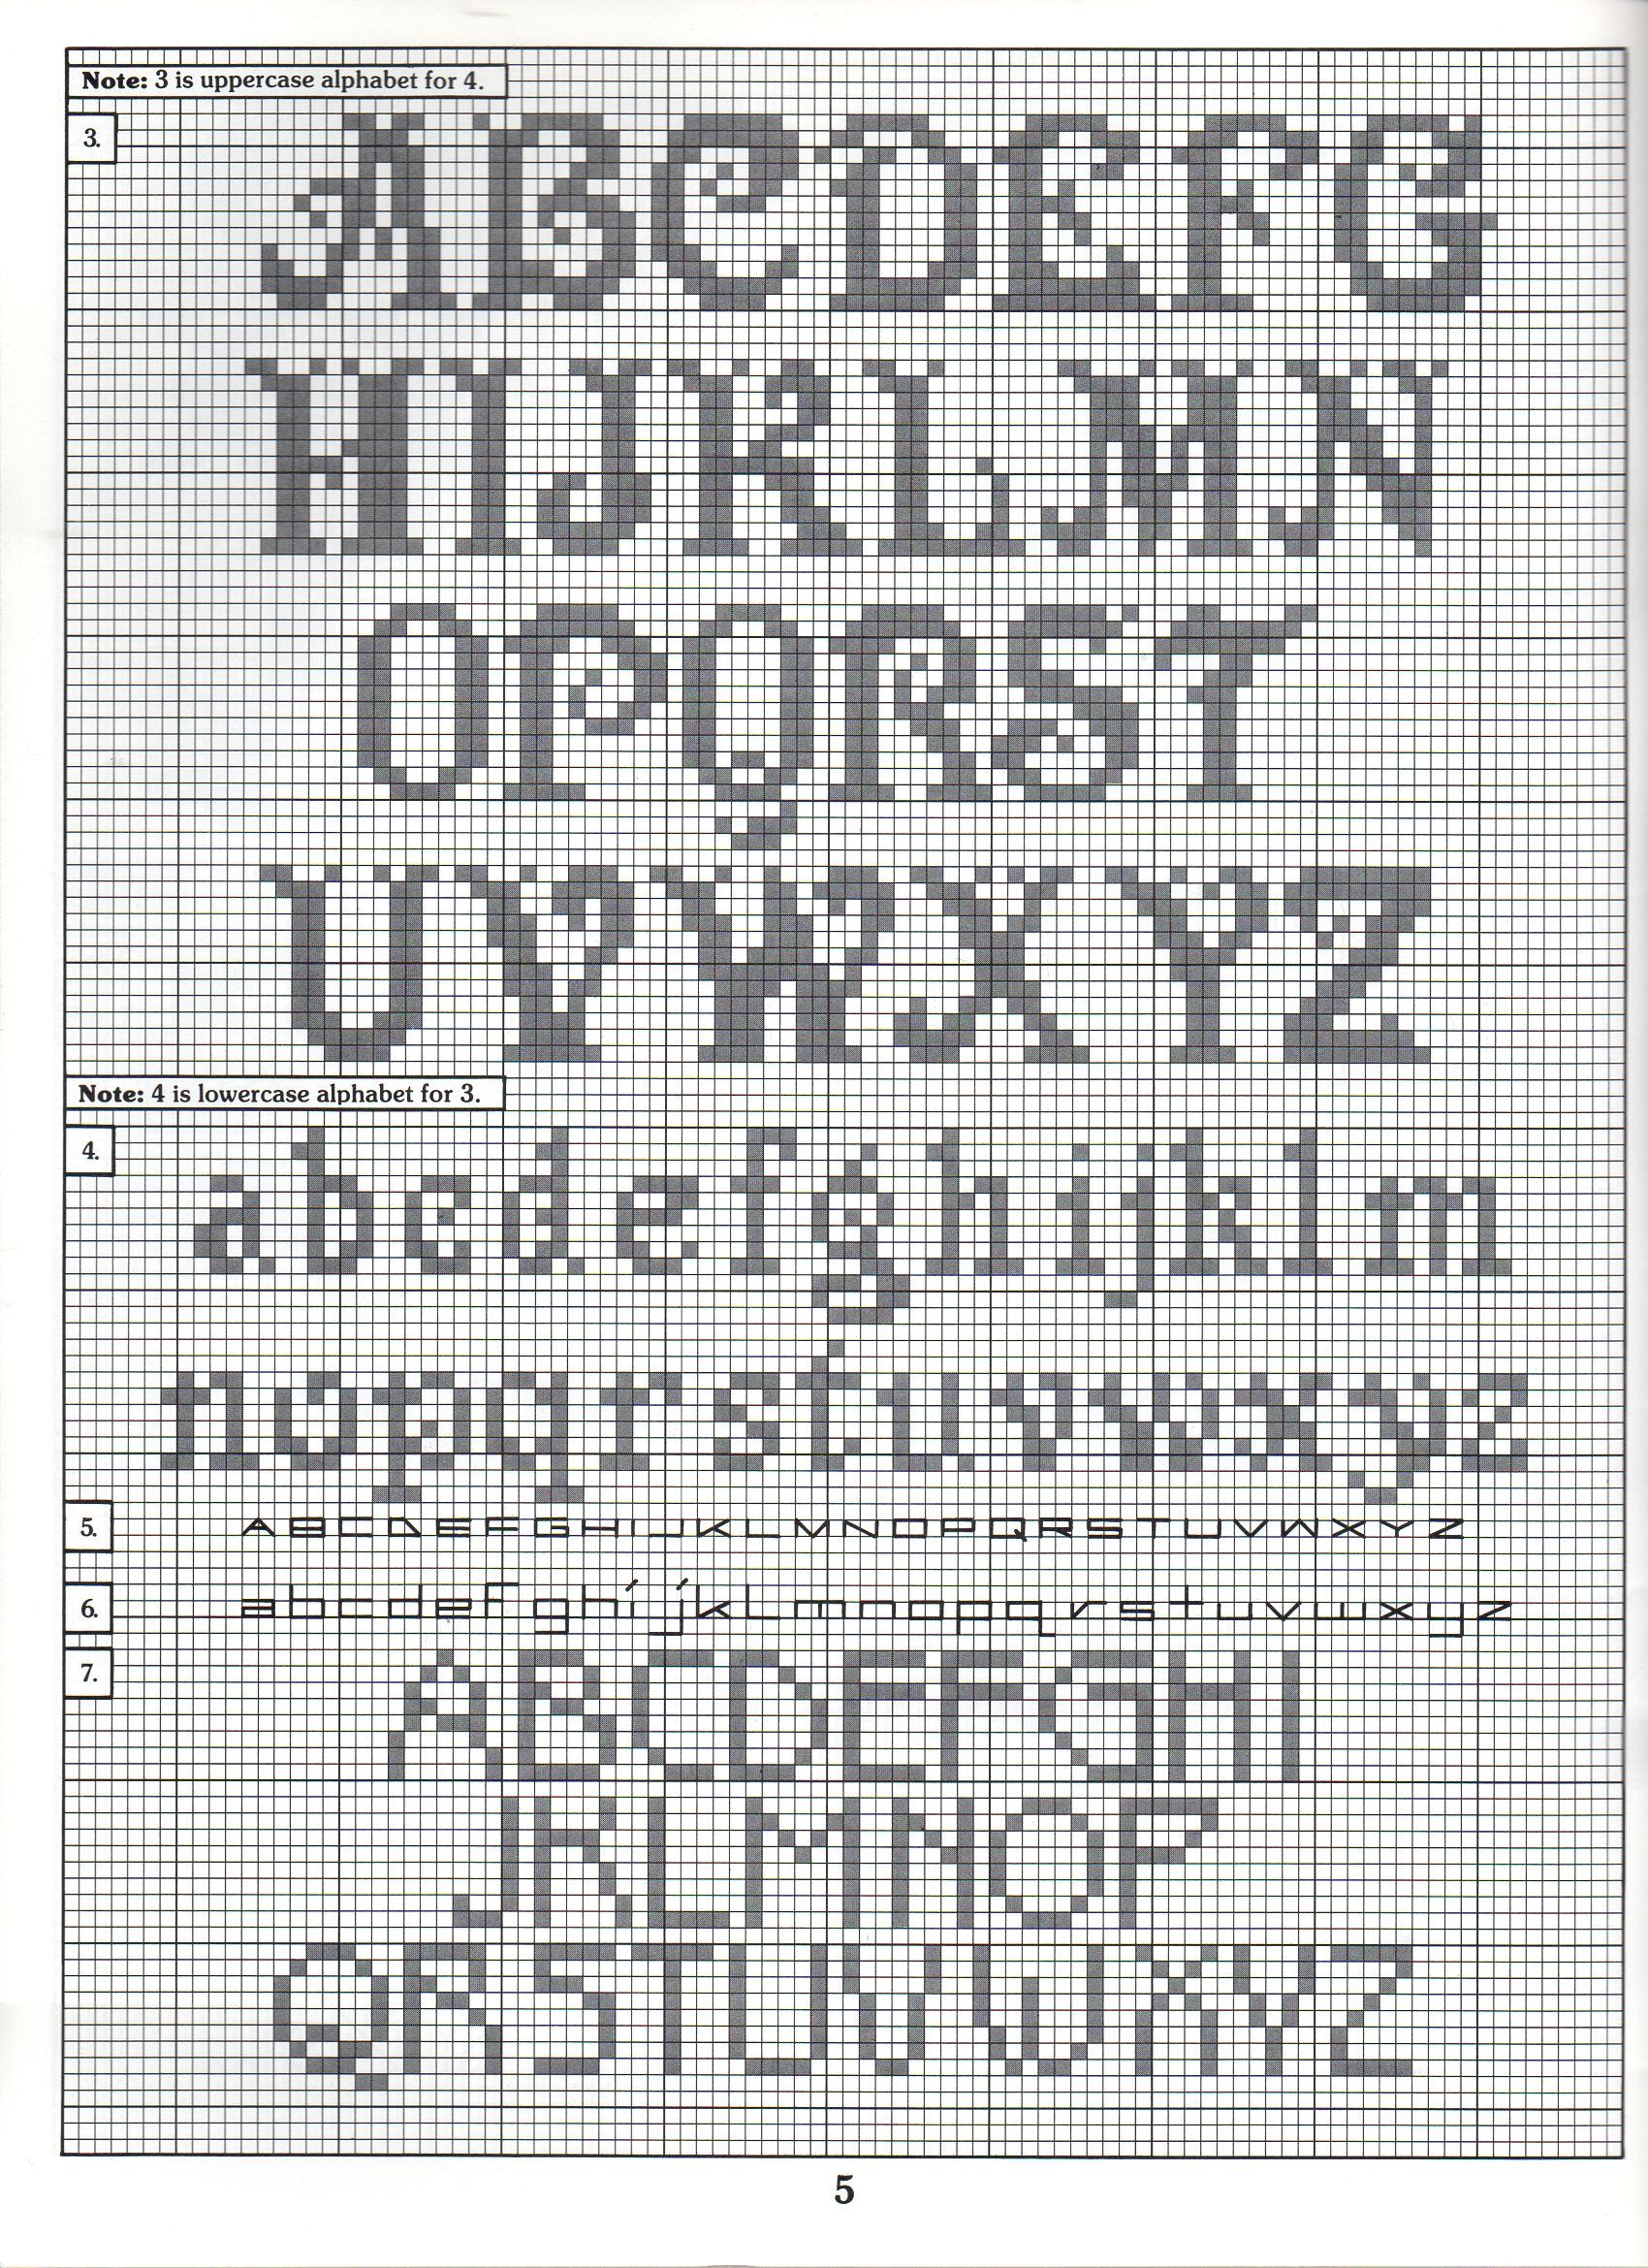 Free Cross Stitch Alphabet Patterns : cross, stitch, alphabet, patterns, ALPHABET, PATTERNS, Cross, Stitch, Letter, Patterns,, Fonts,, Alphabet, Patterns